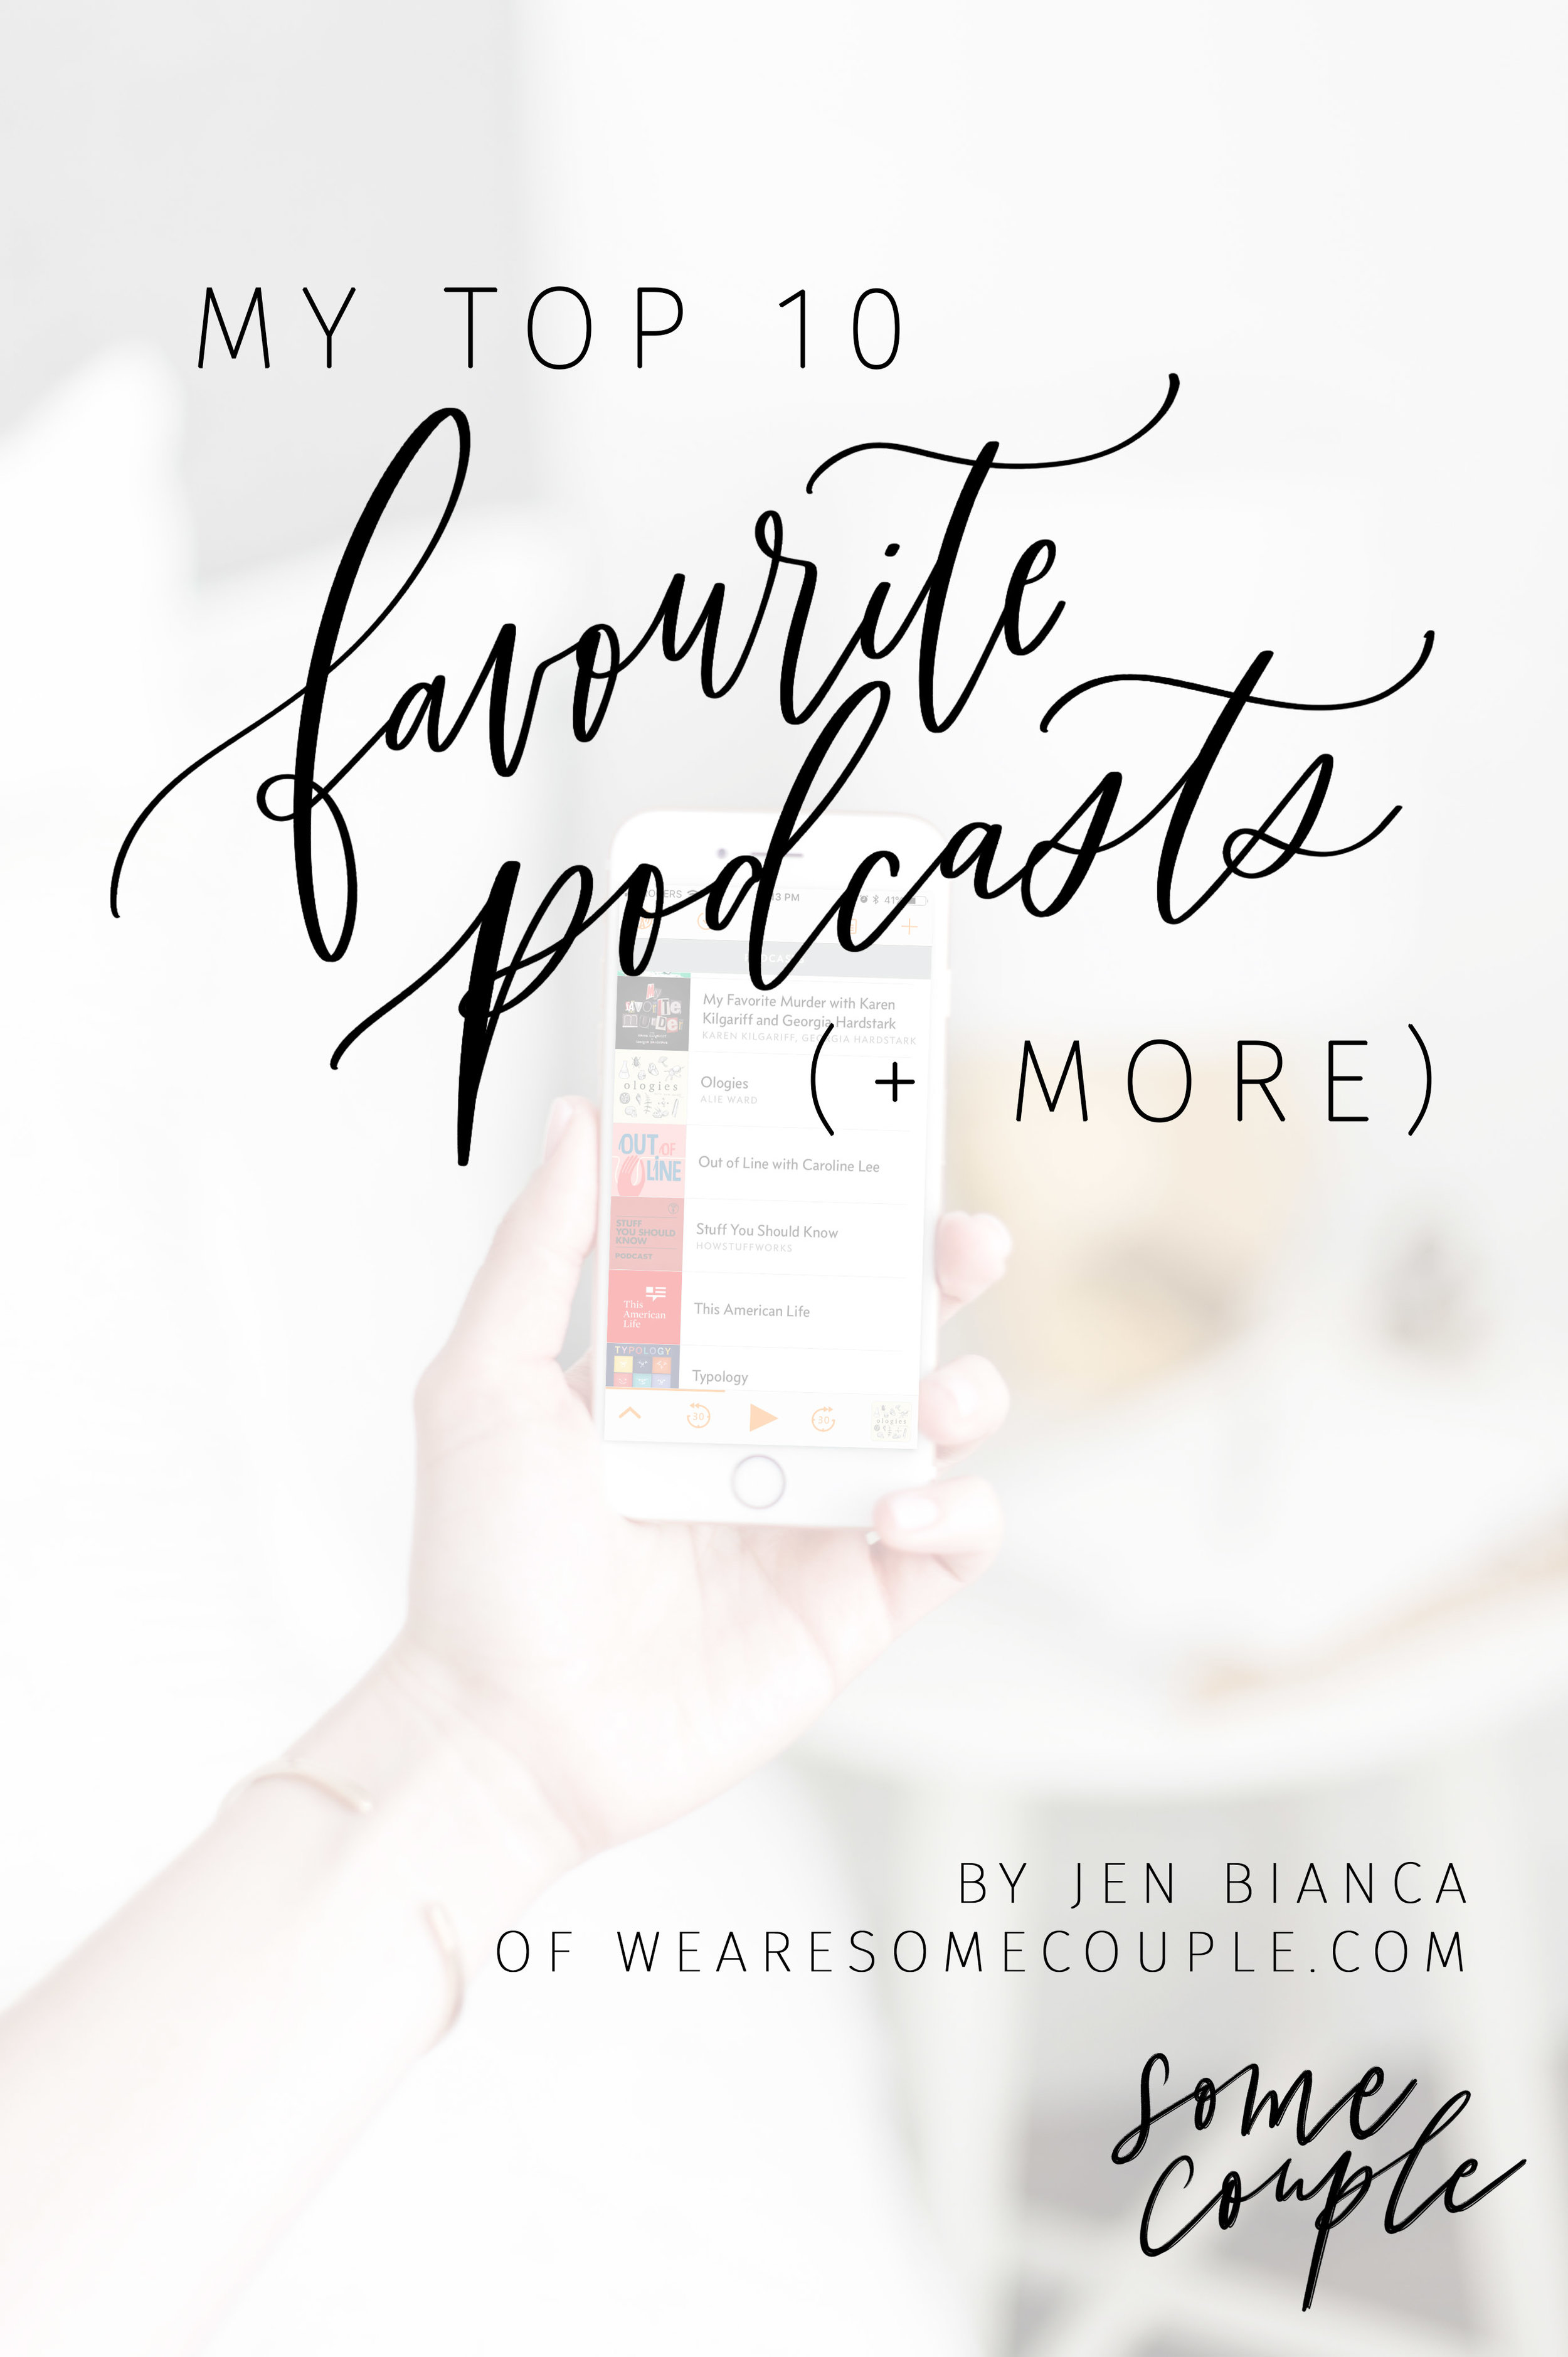 My top 10 podcasts by Jennifer Bianca of wearesomecouple.com